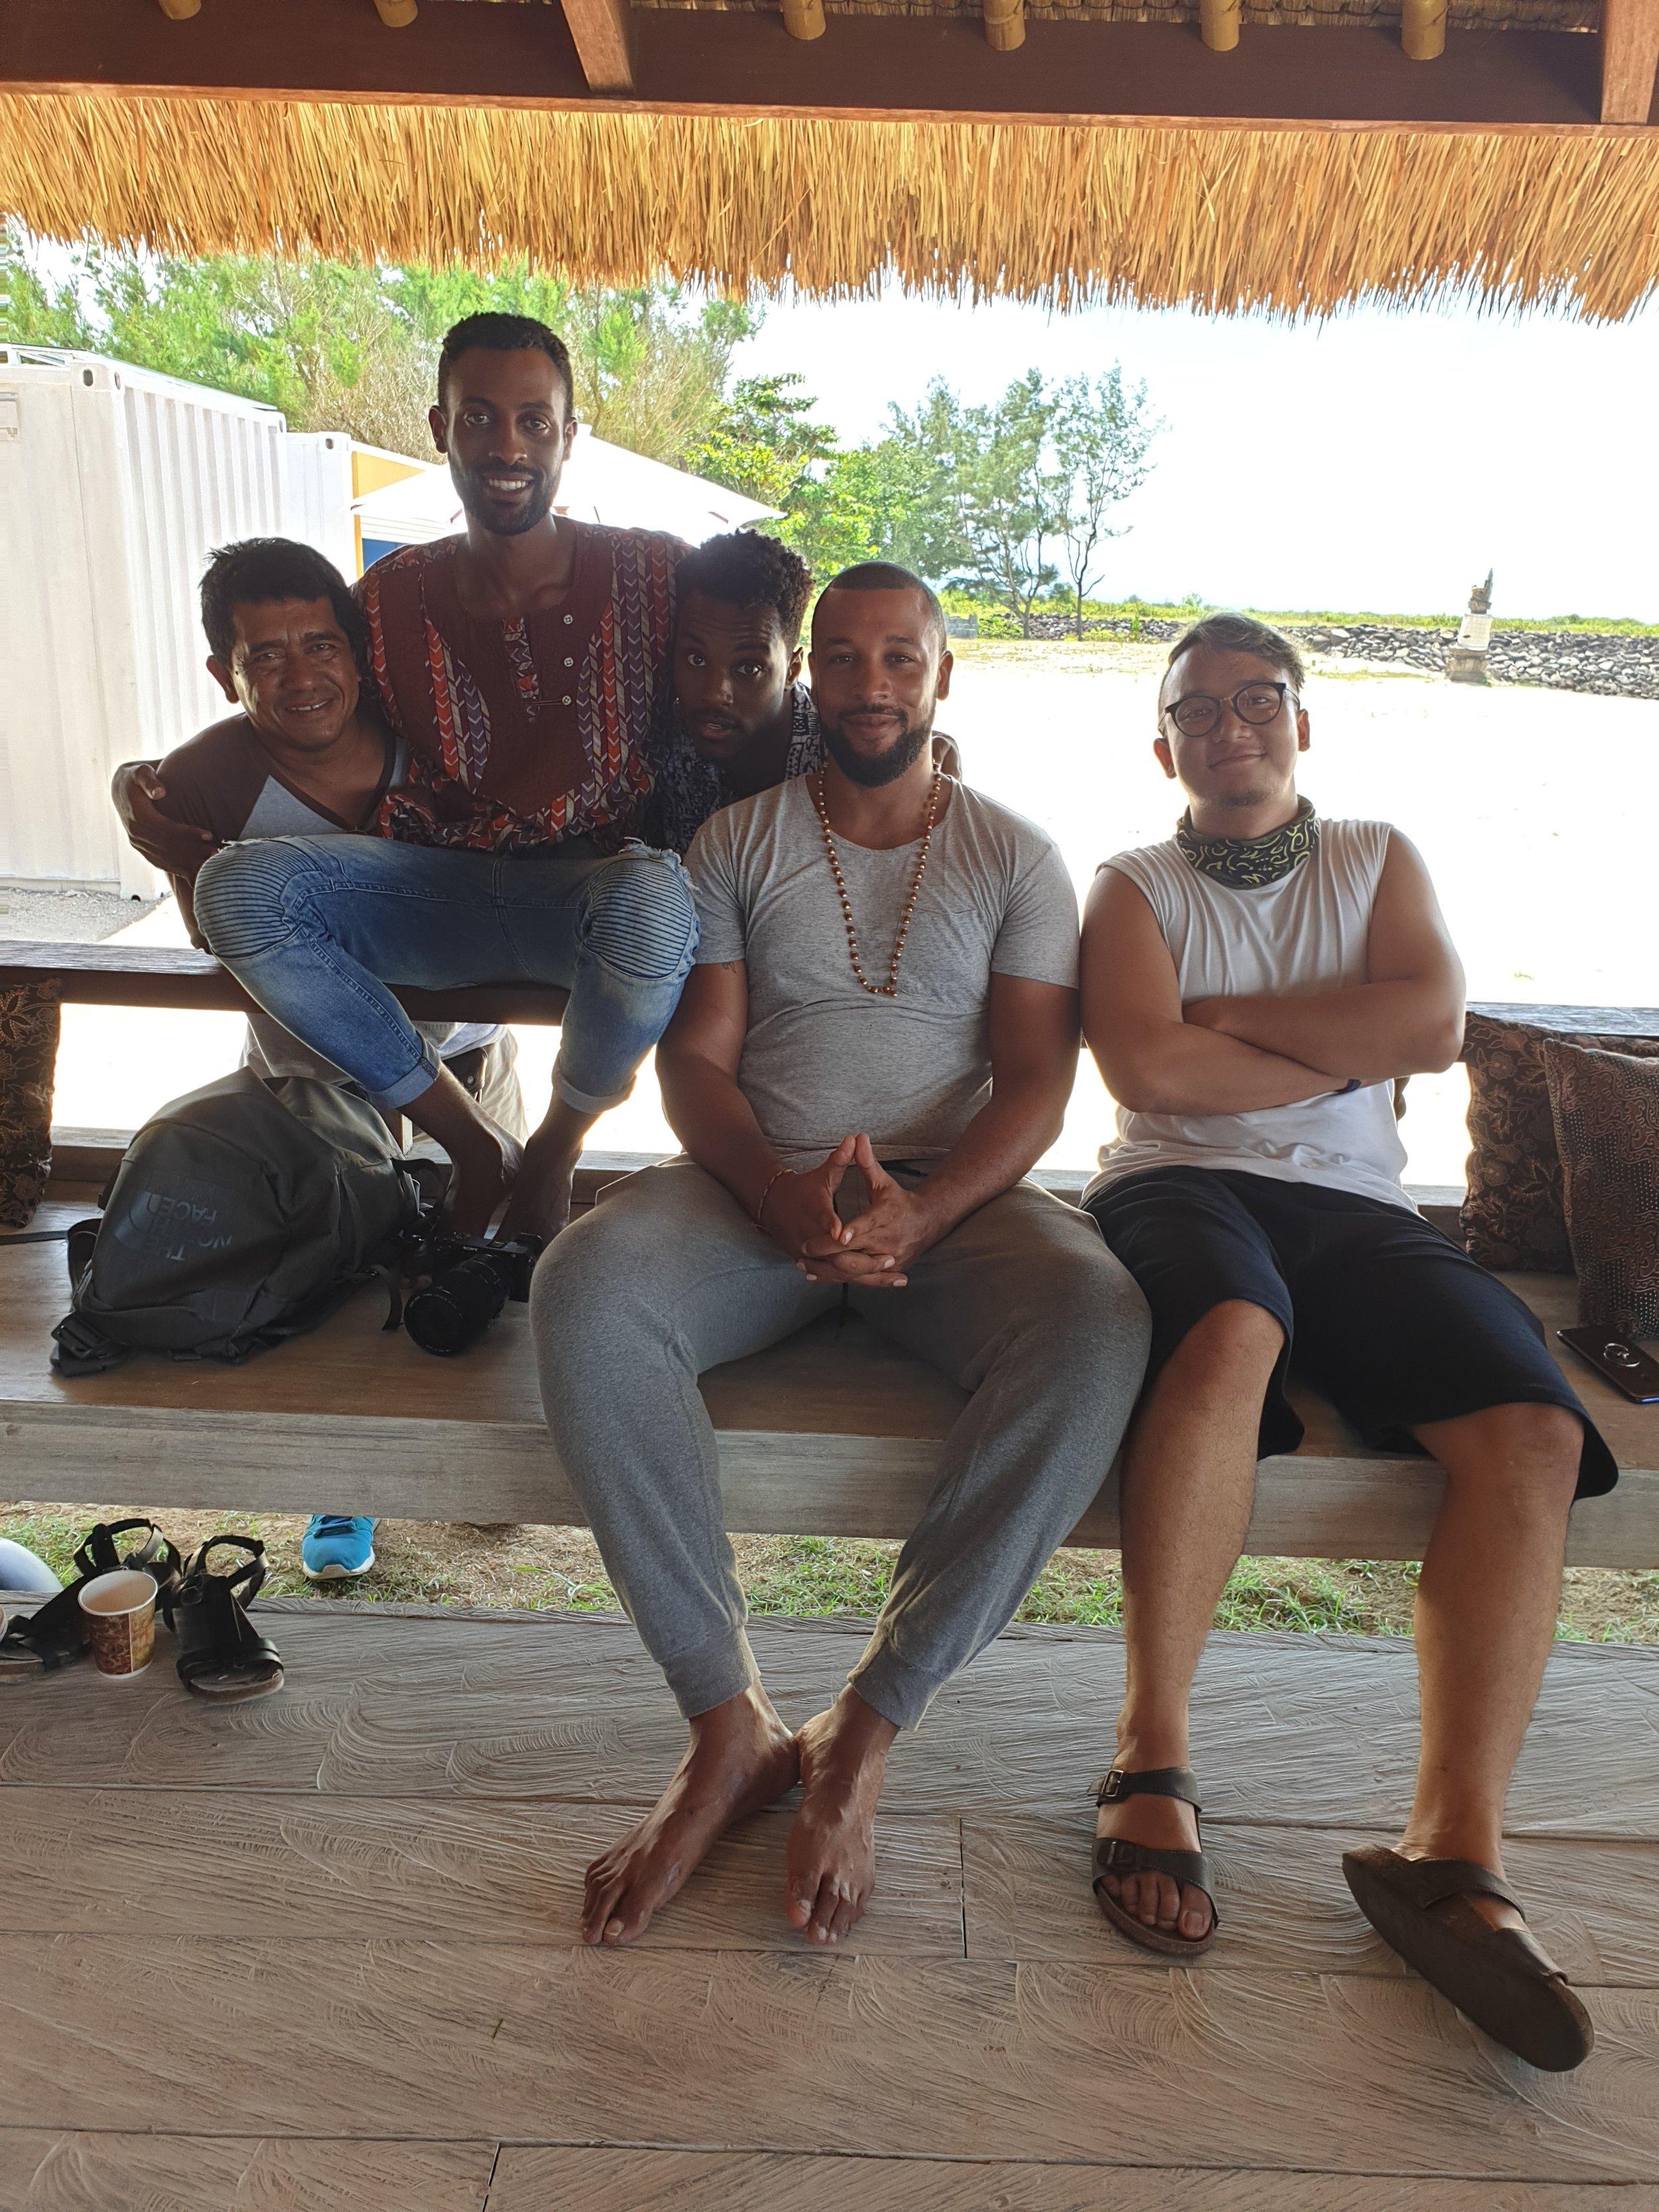 From left: Made, Driver & friend (Bali) - Joseph, Videographer - Gaylord, Usher - Dominique, Rapper & Poet - Aditya, Kura Kura Bali team